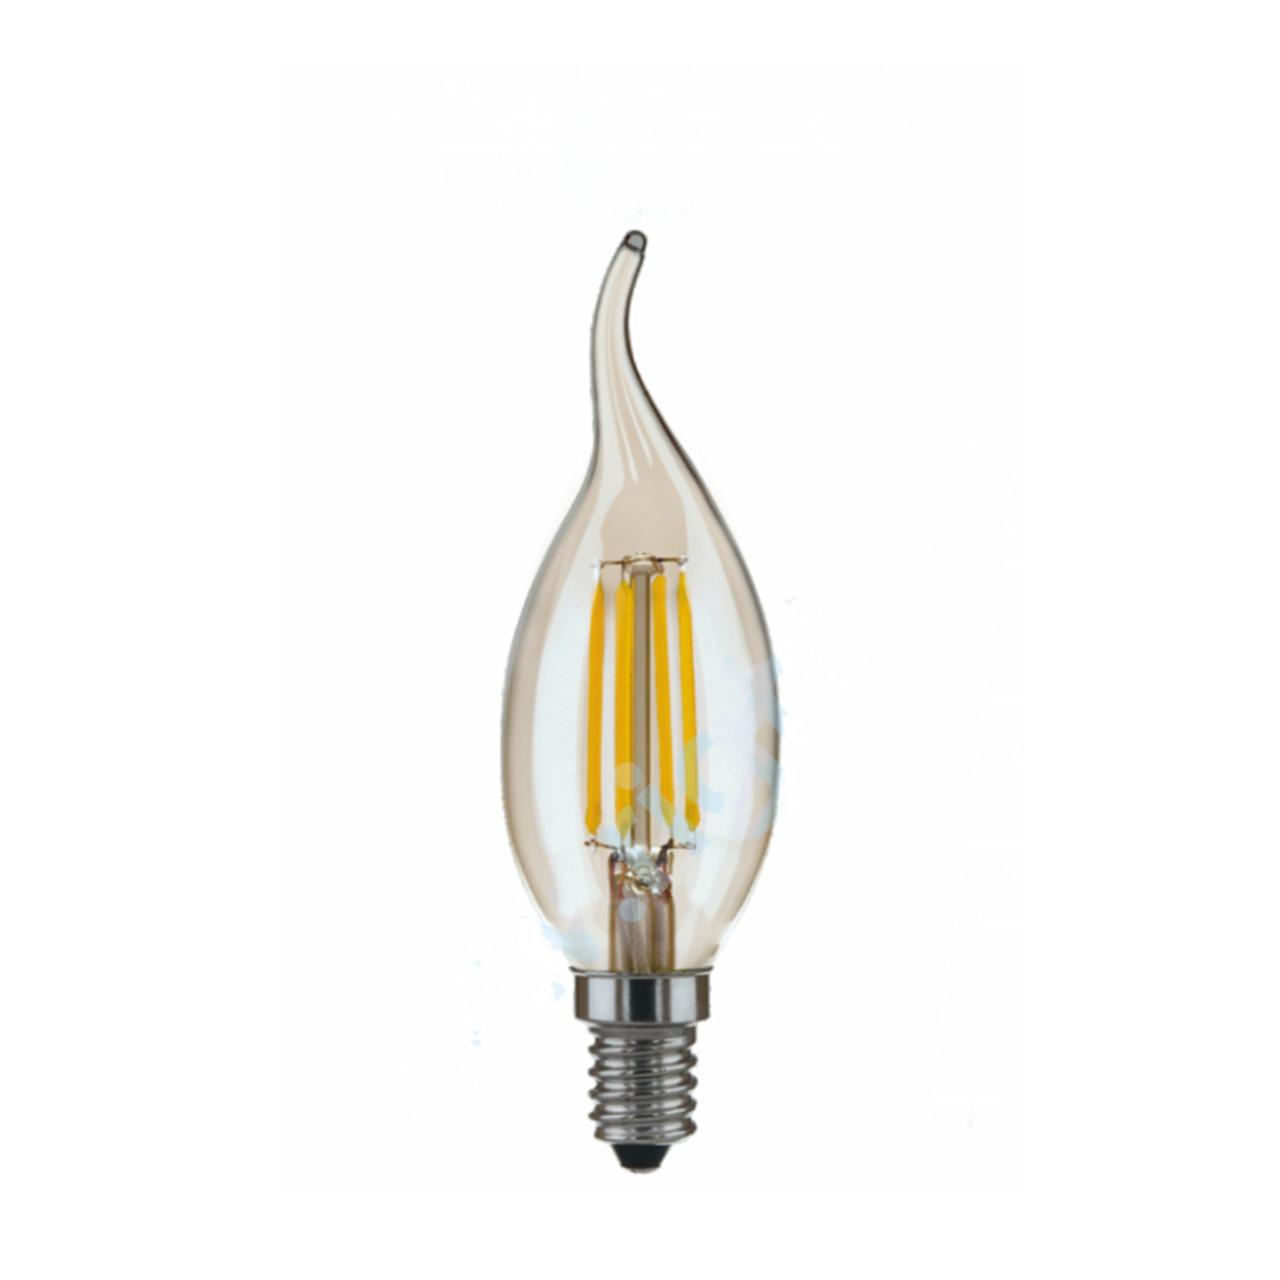 Лампа LED Platinum Filament Свічка на вітрі 6W E14 4000K, золота C35T RIGHT HAUSEN